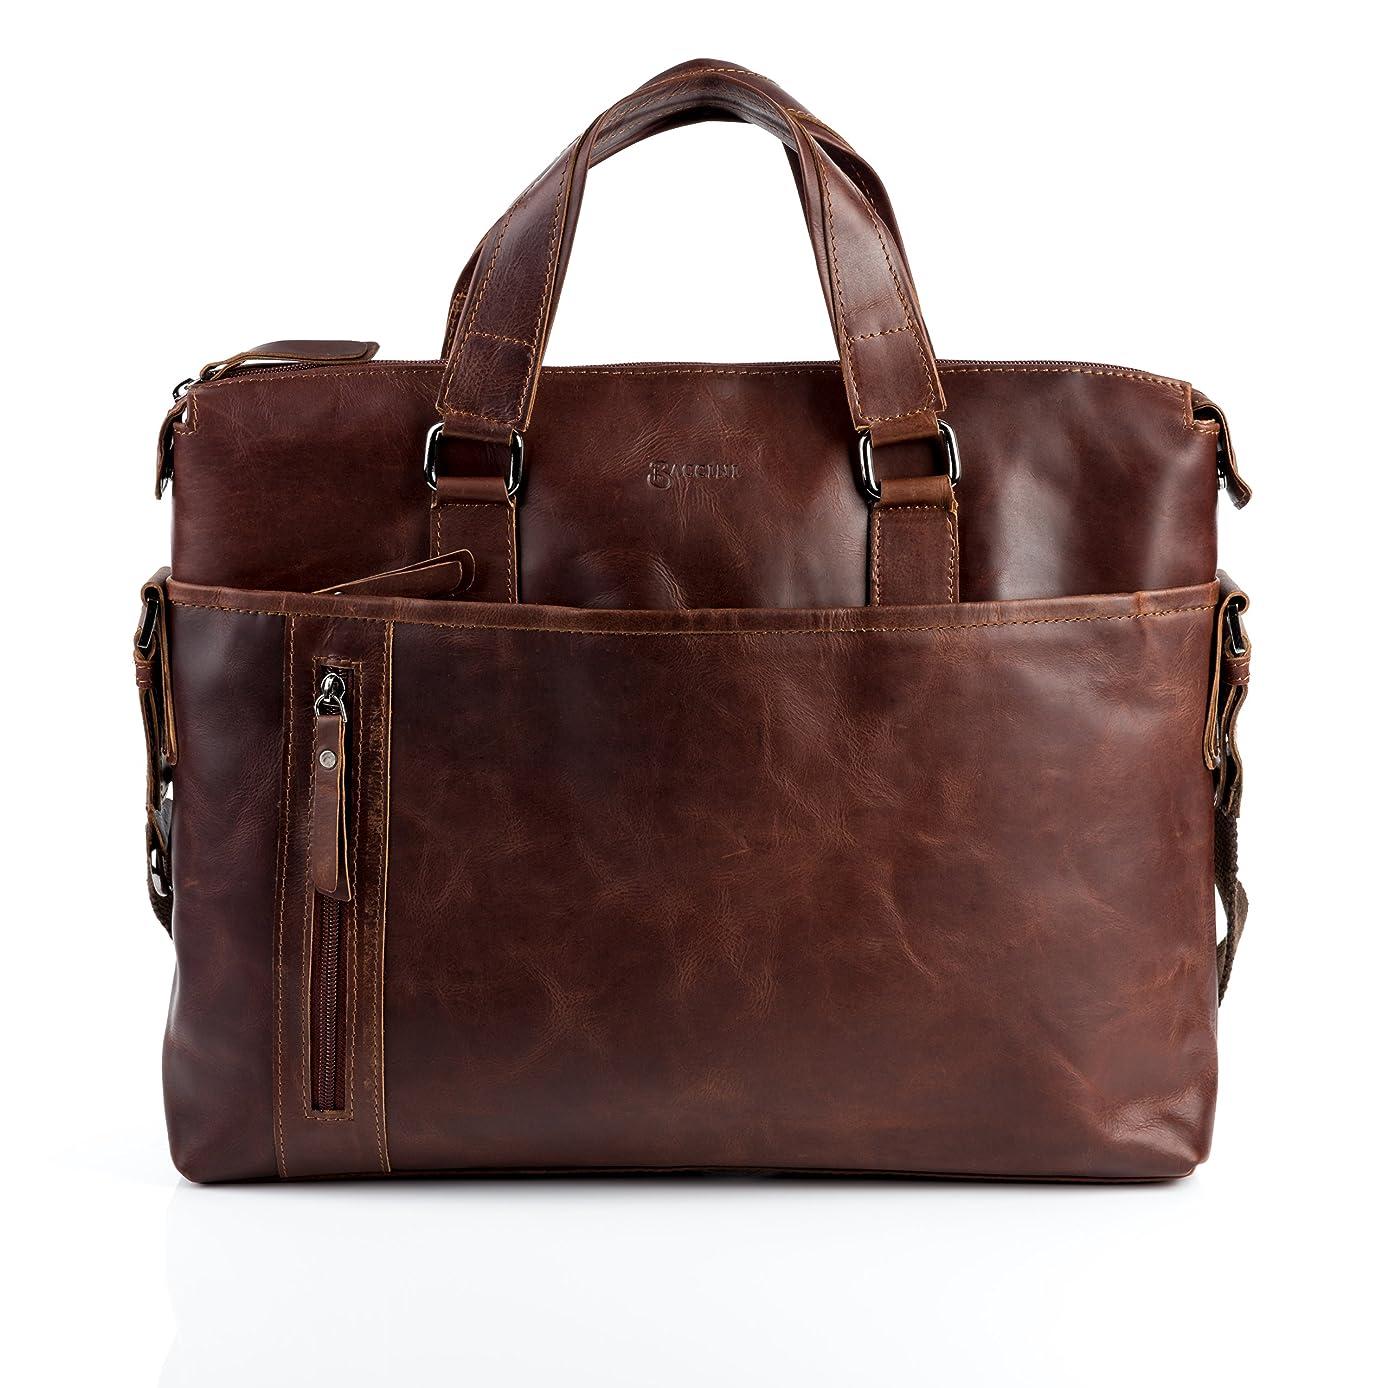 BACCINI real leather laptop bag LEANDRO large business office work school shoulder bag 15 inch satchel briefcase 15.6